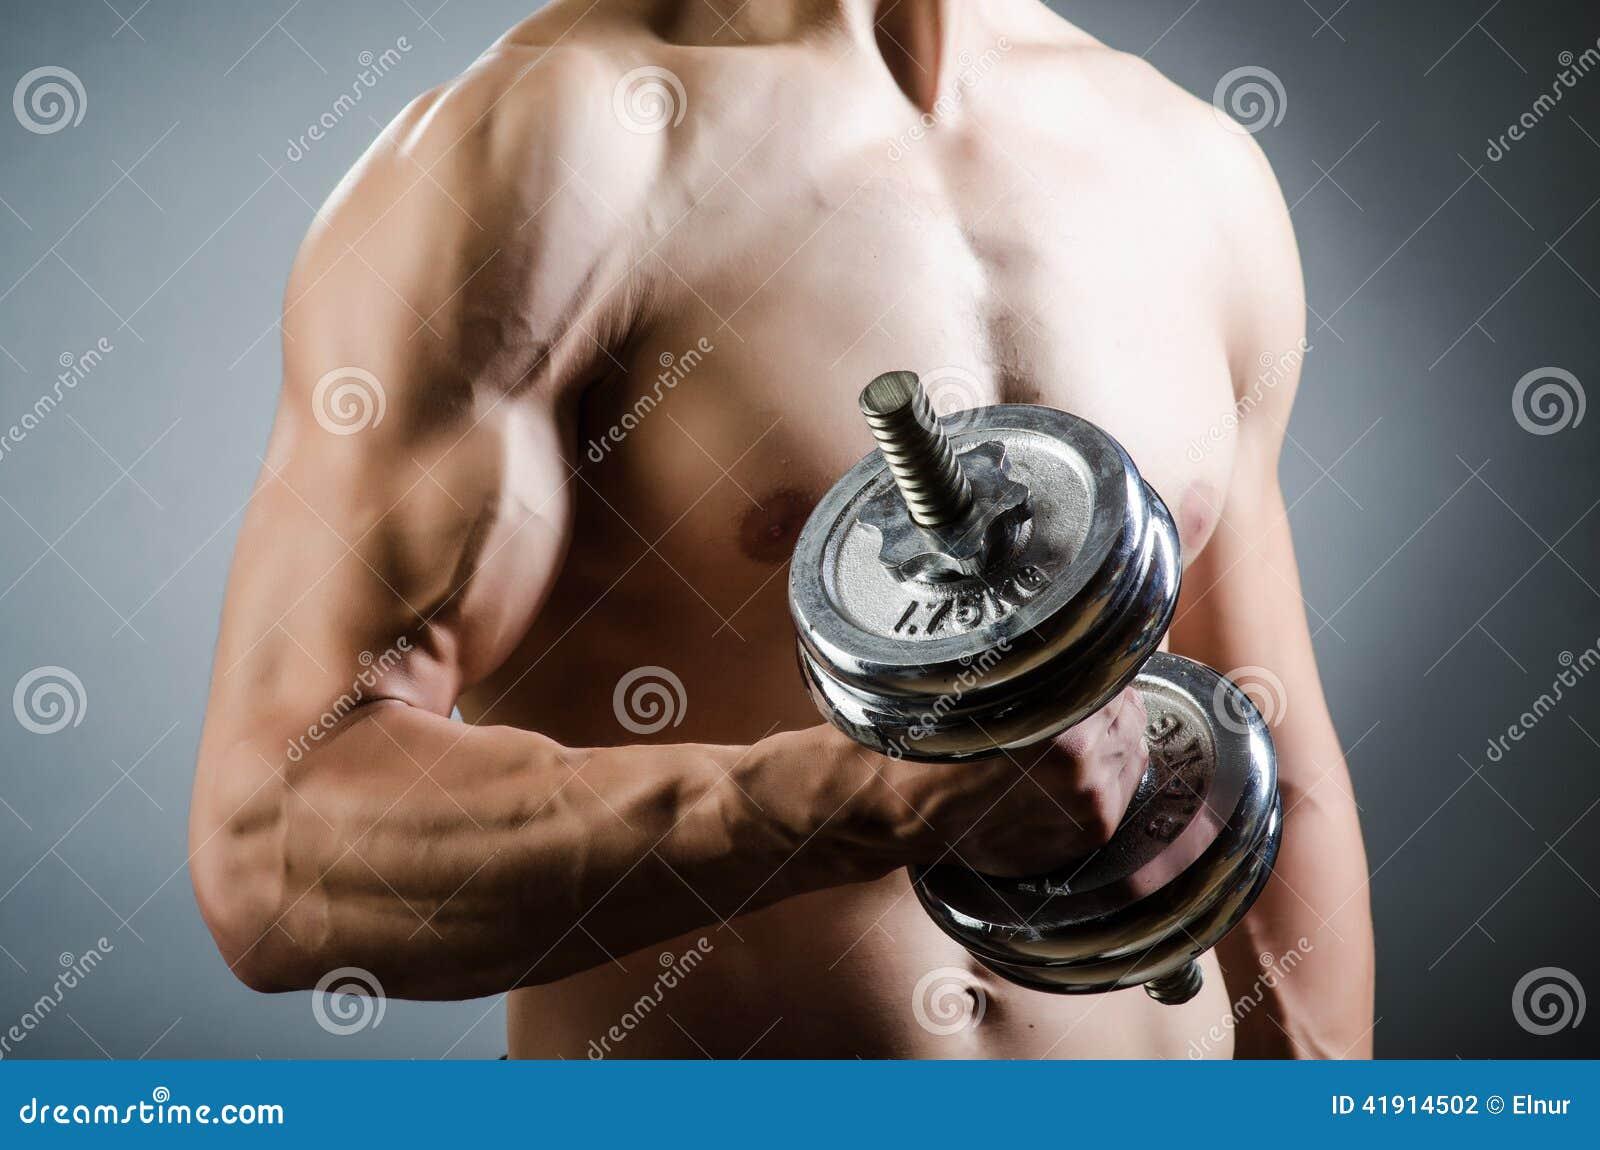 Culturista rasgado muscular